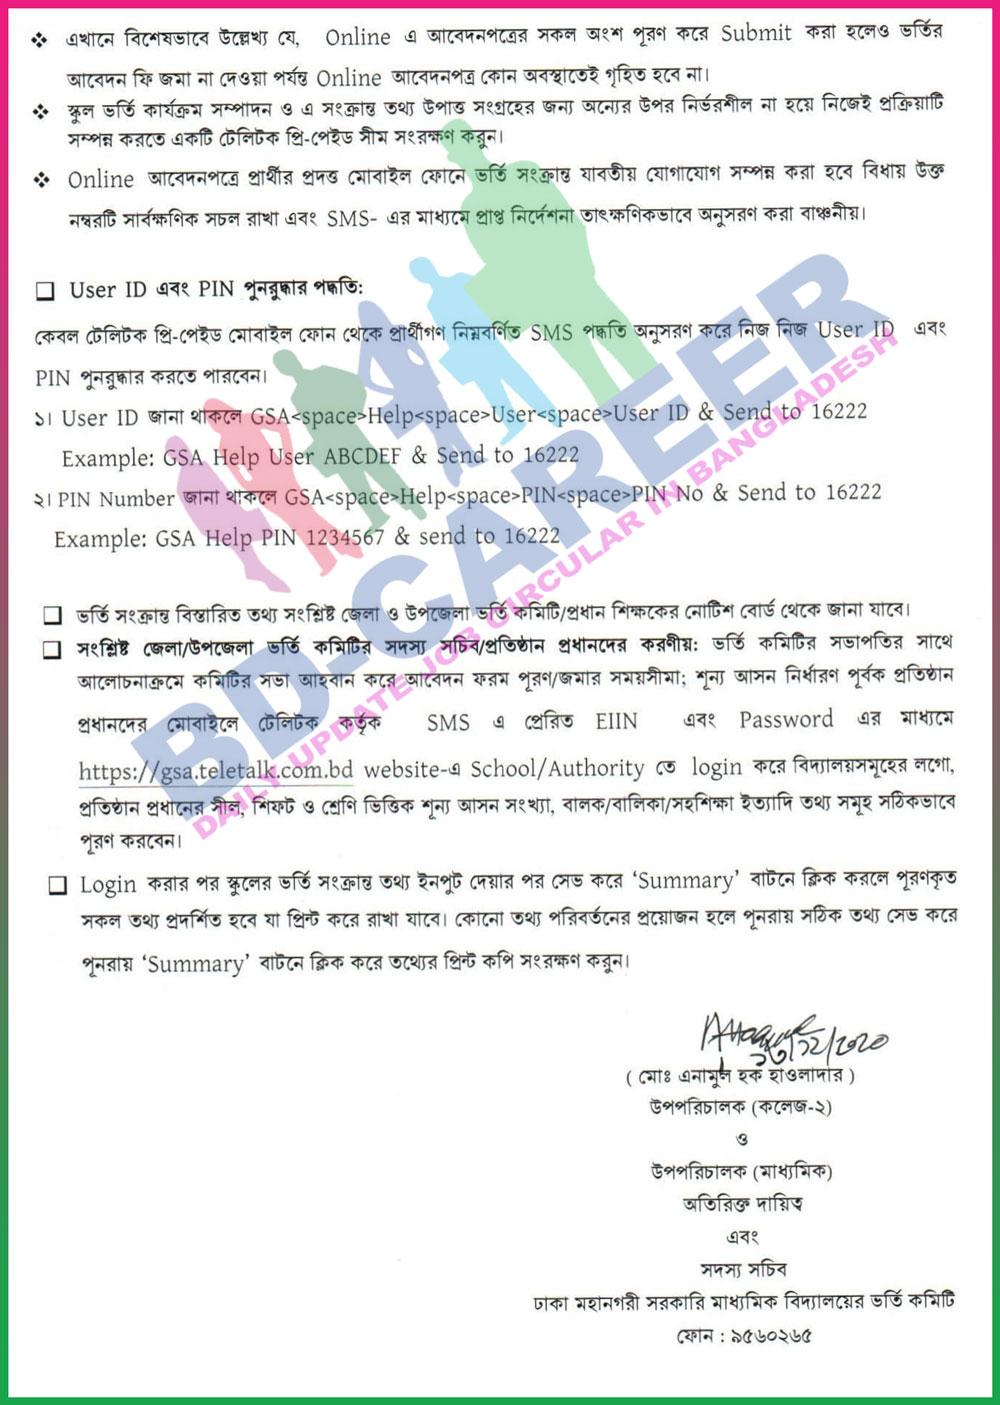 GSA Teletalk BD 2020 - gsa.teletalk.com.bd